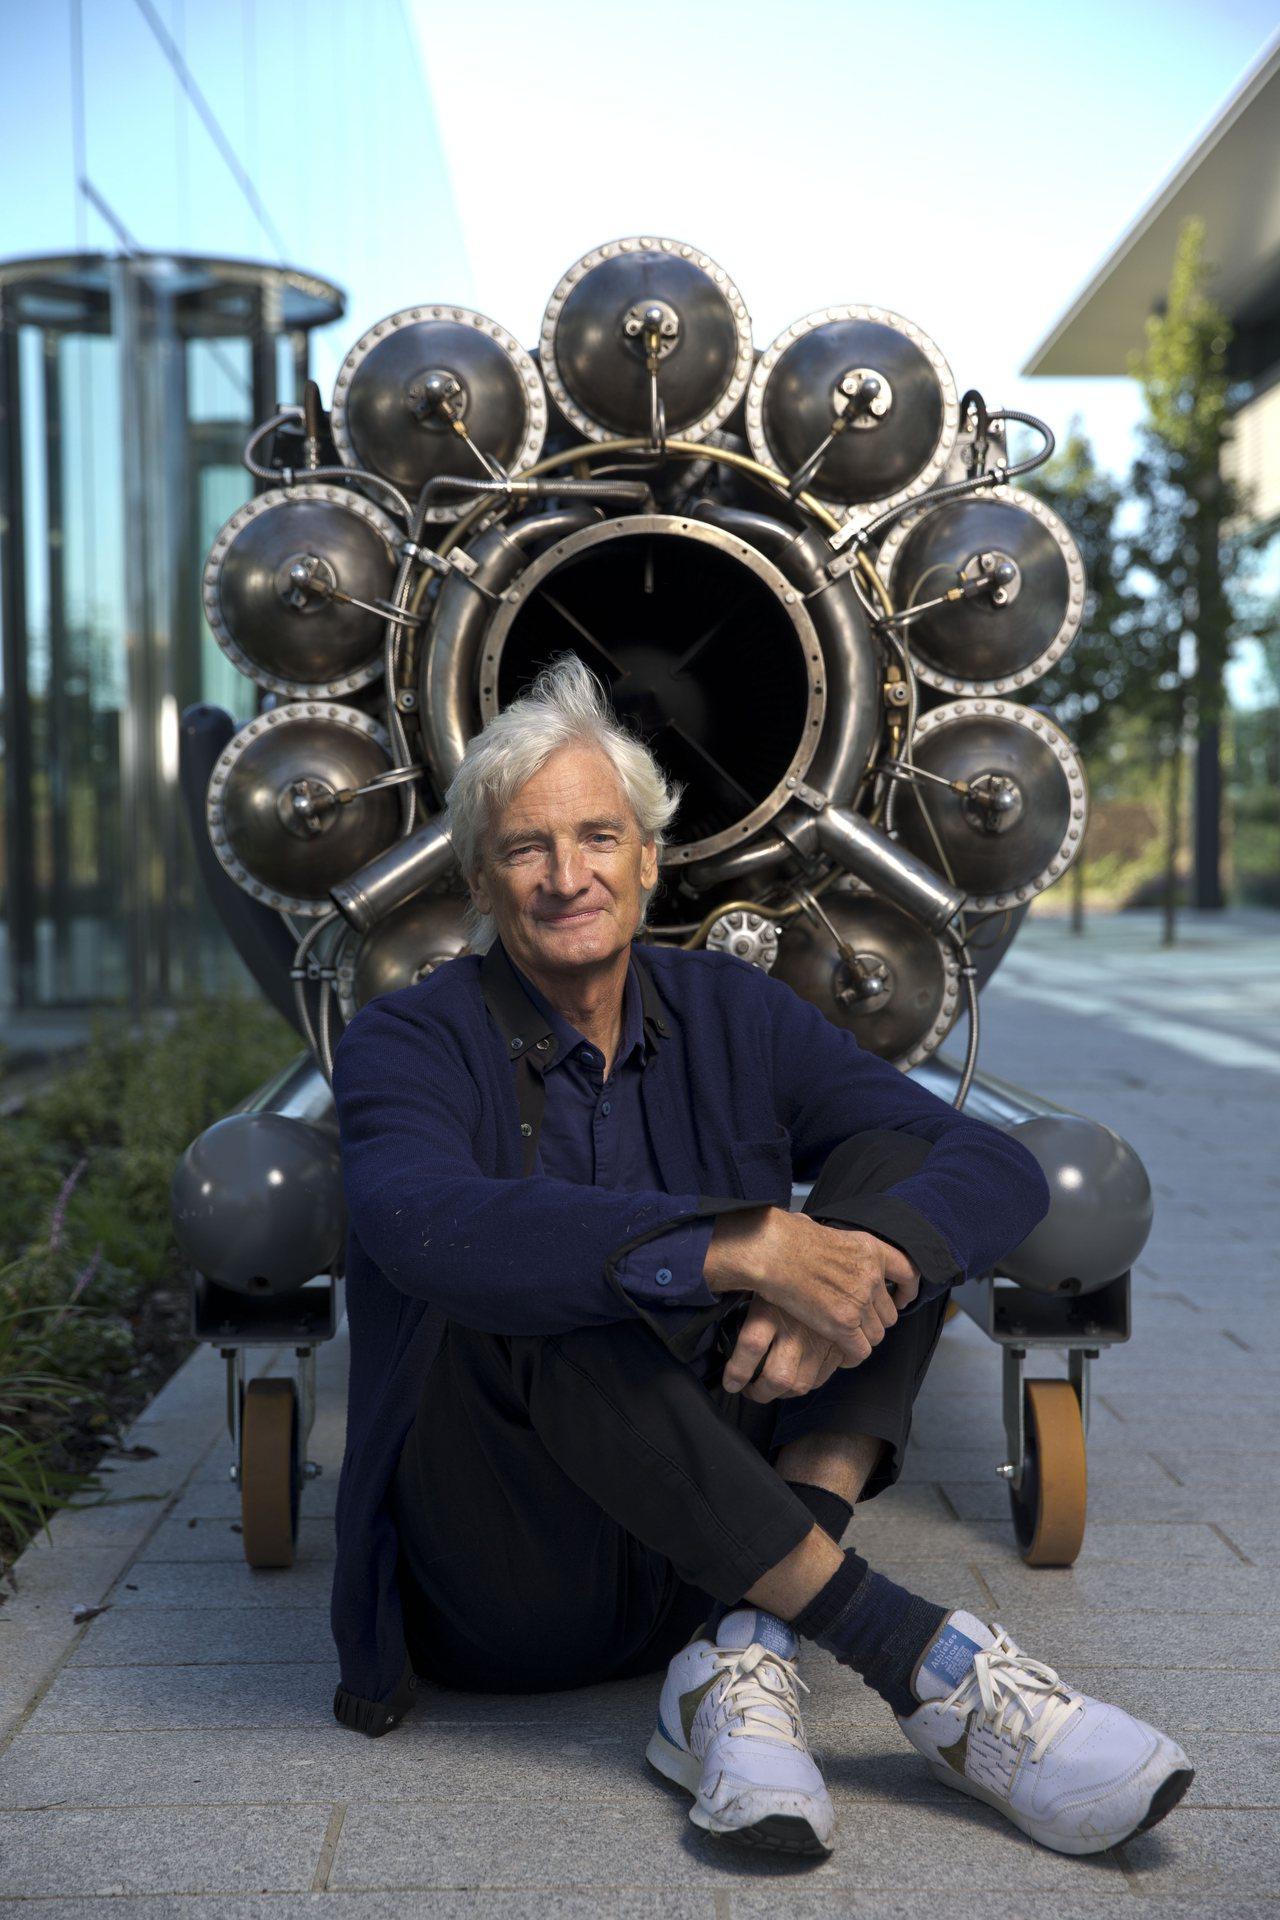 Dyson創辦人James Dyson今日宣布Dyson已經開始在電動車上的工作...